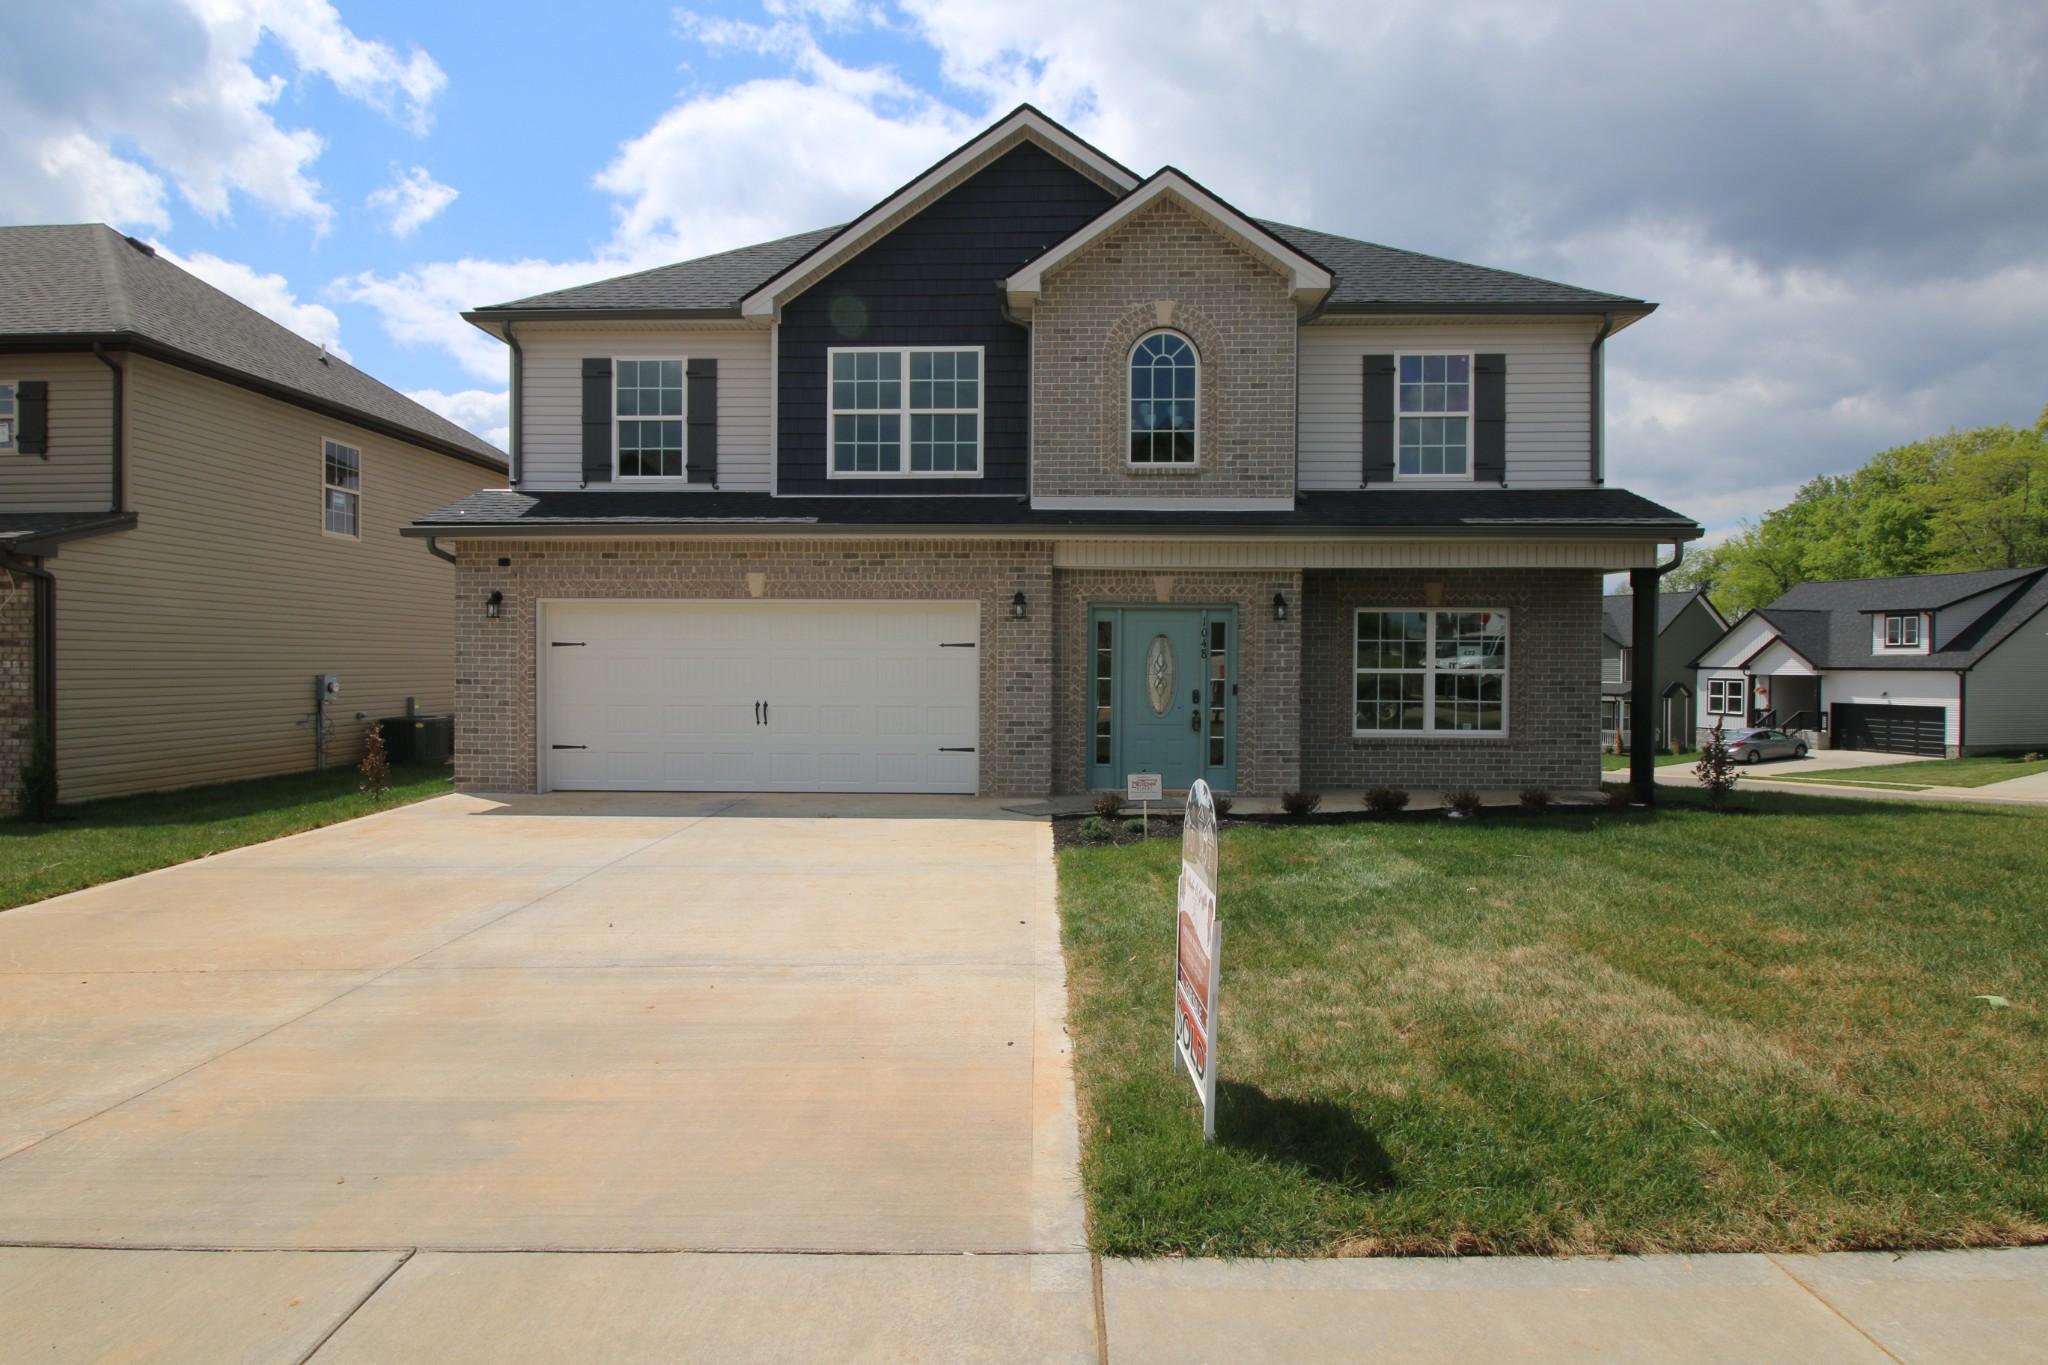 472 Autumn Creek Property Photo - Clarksville, TN real estate listing